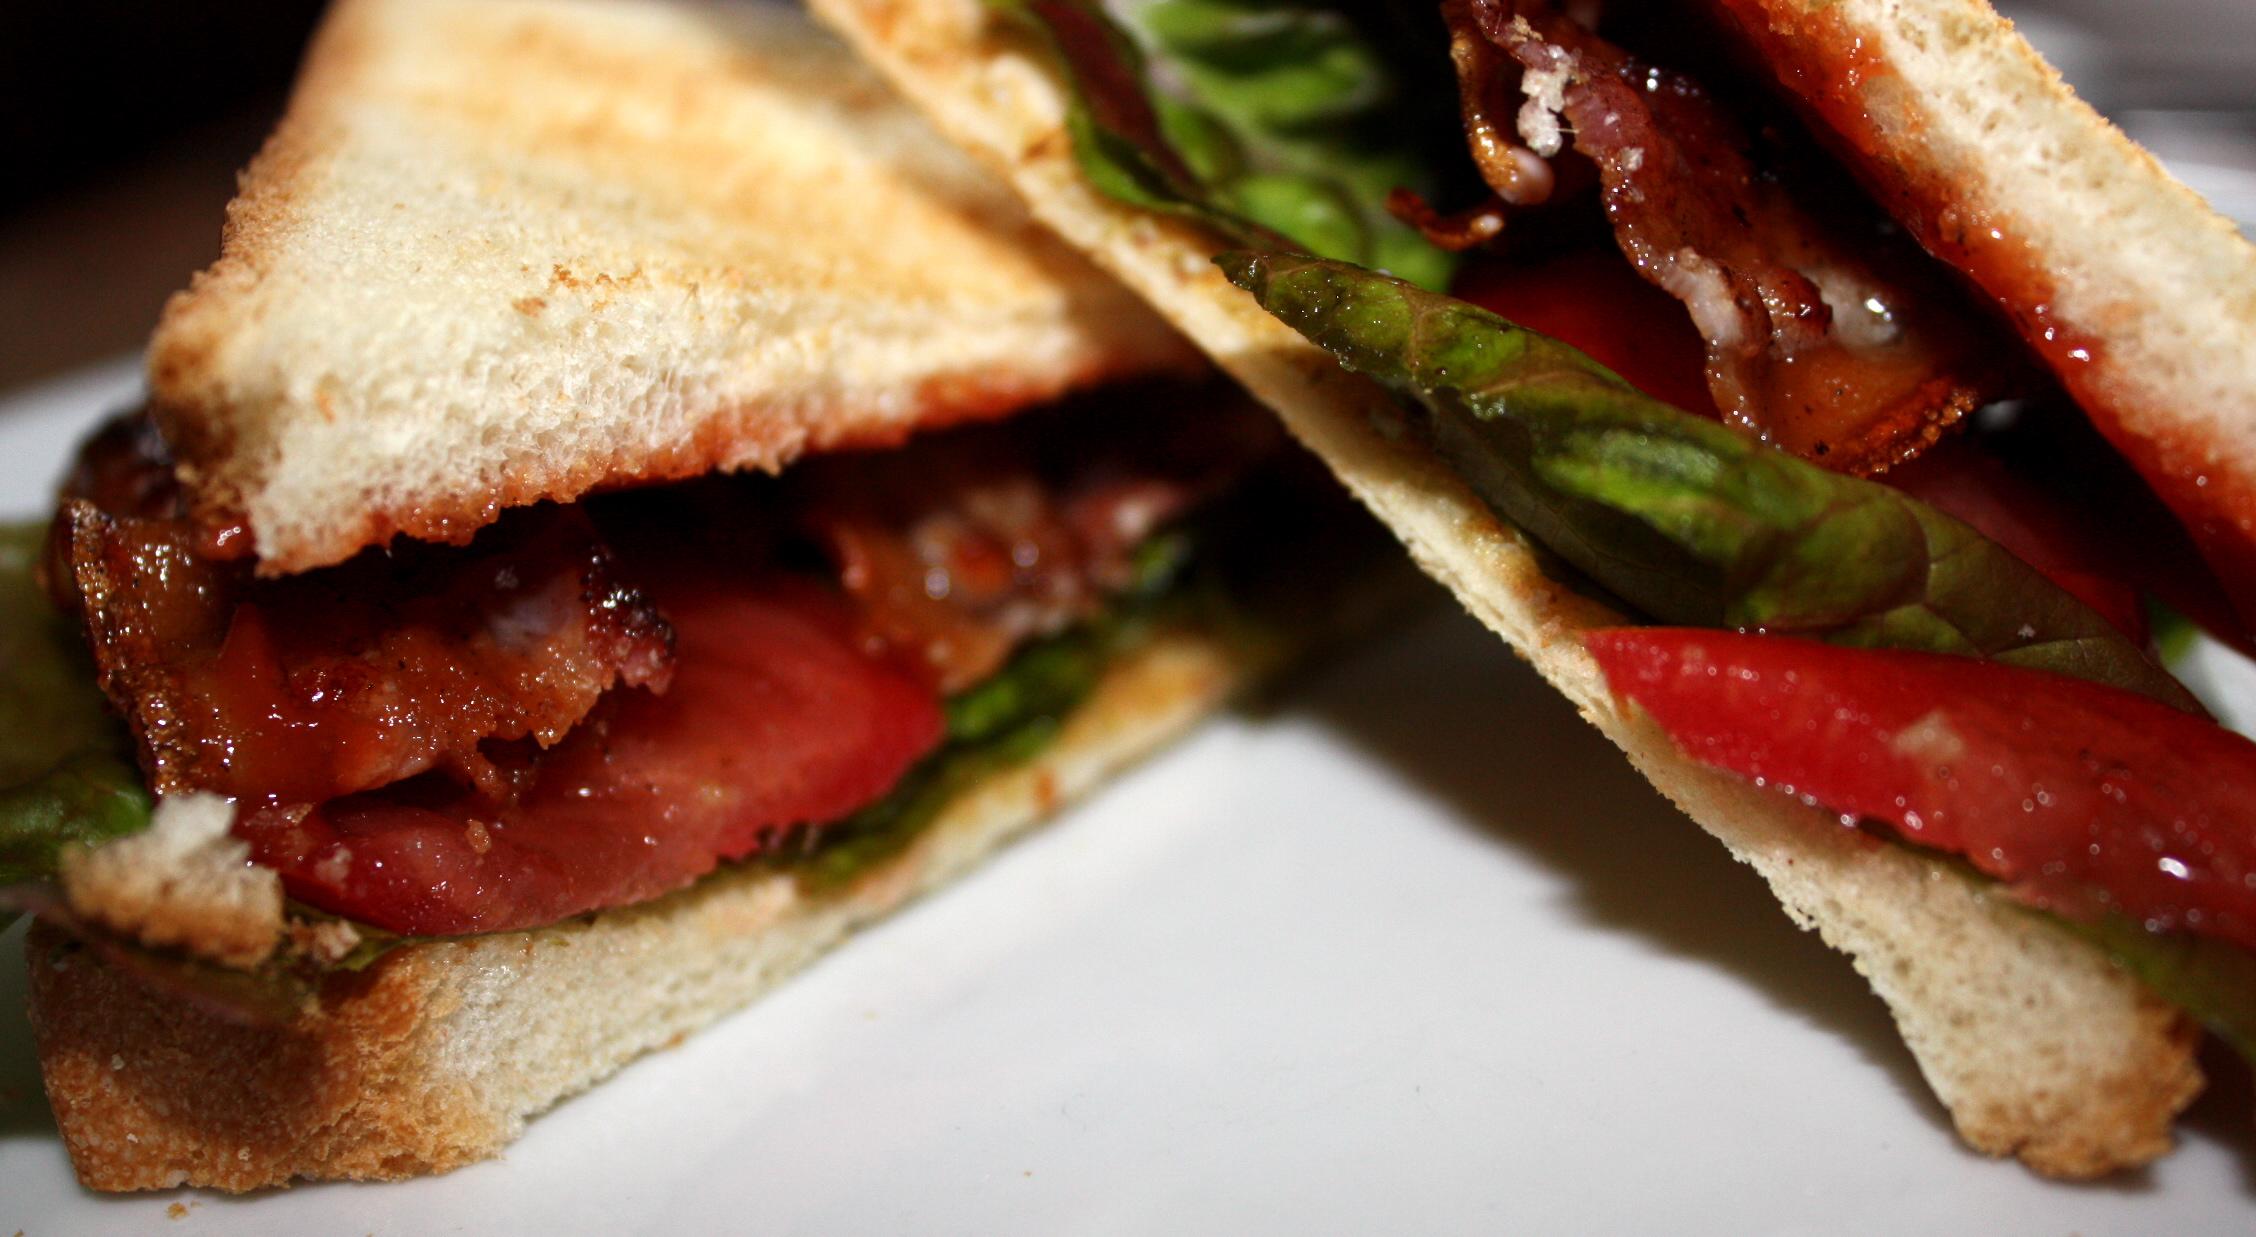 Sandwich am Sonntag – BLT